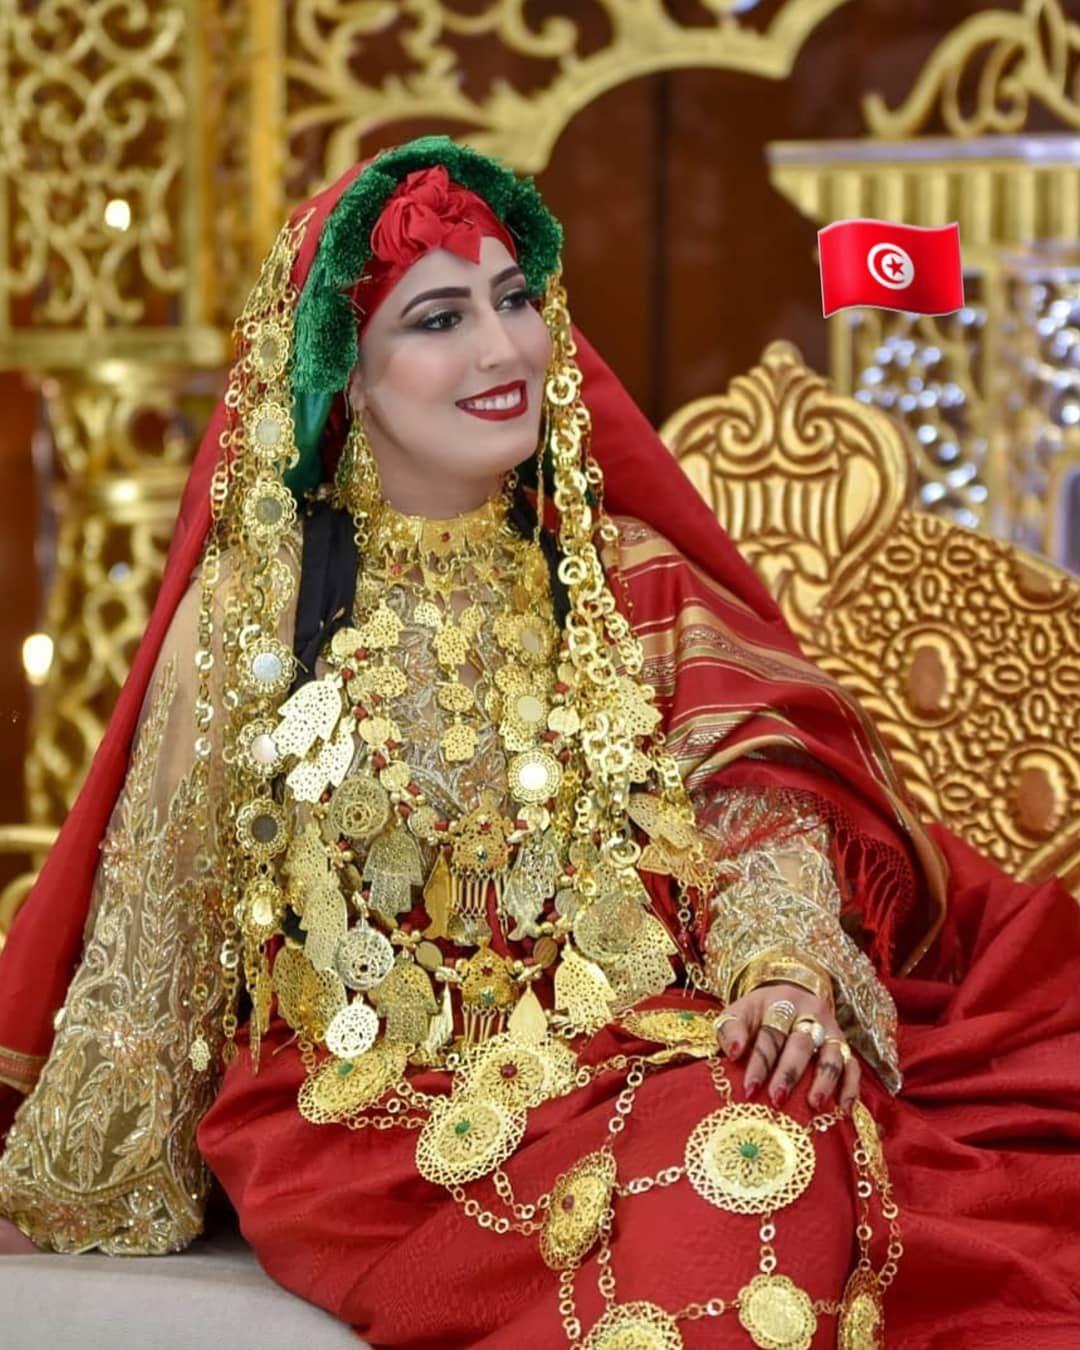 250 Likes 2 Comments Tunisian Culture Official On Instagram أناقة عروسة تونسية من مدينة قابس ب الحولي القابسي مشاء الل Fashion Crown Jewelry Crown